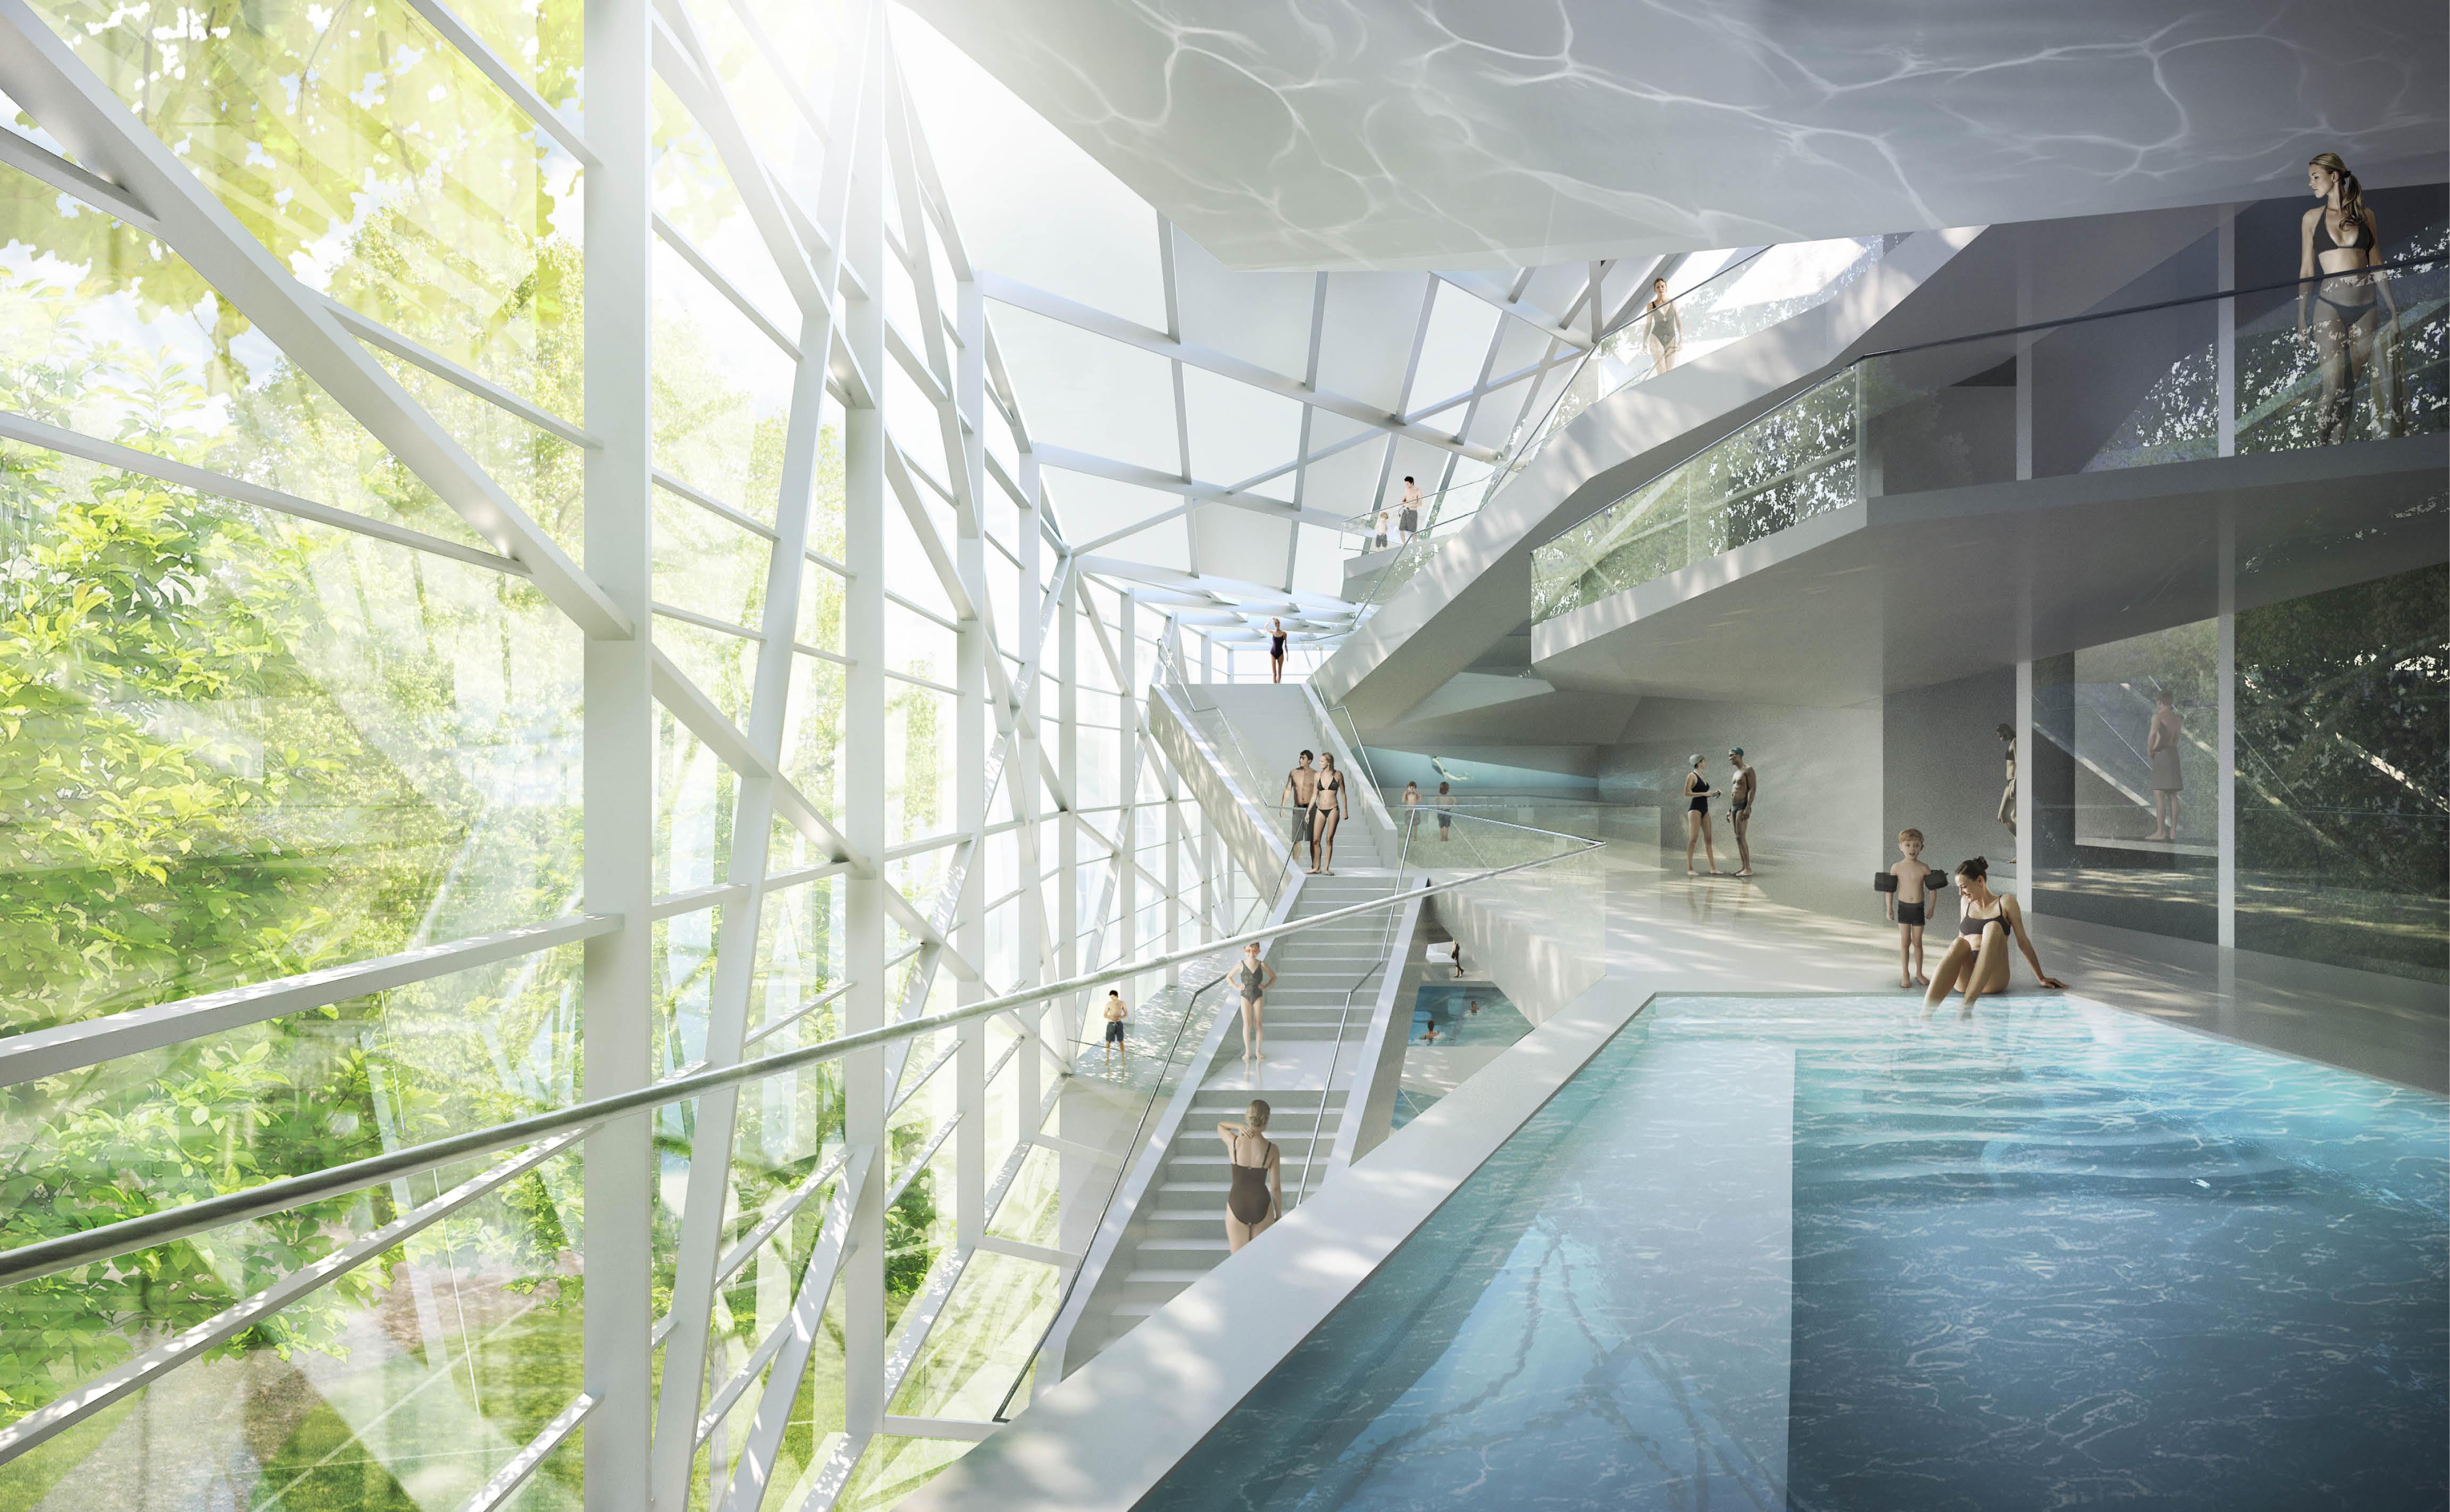 Proposta Vencedora para o Novo Paracelsus Spa e Piscinas em Salzburg / HMGB Architects, ©  bloomimages / HMGB Architects